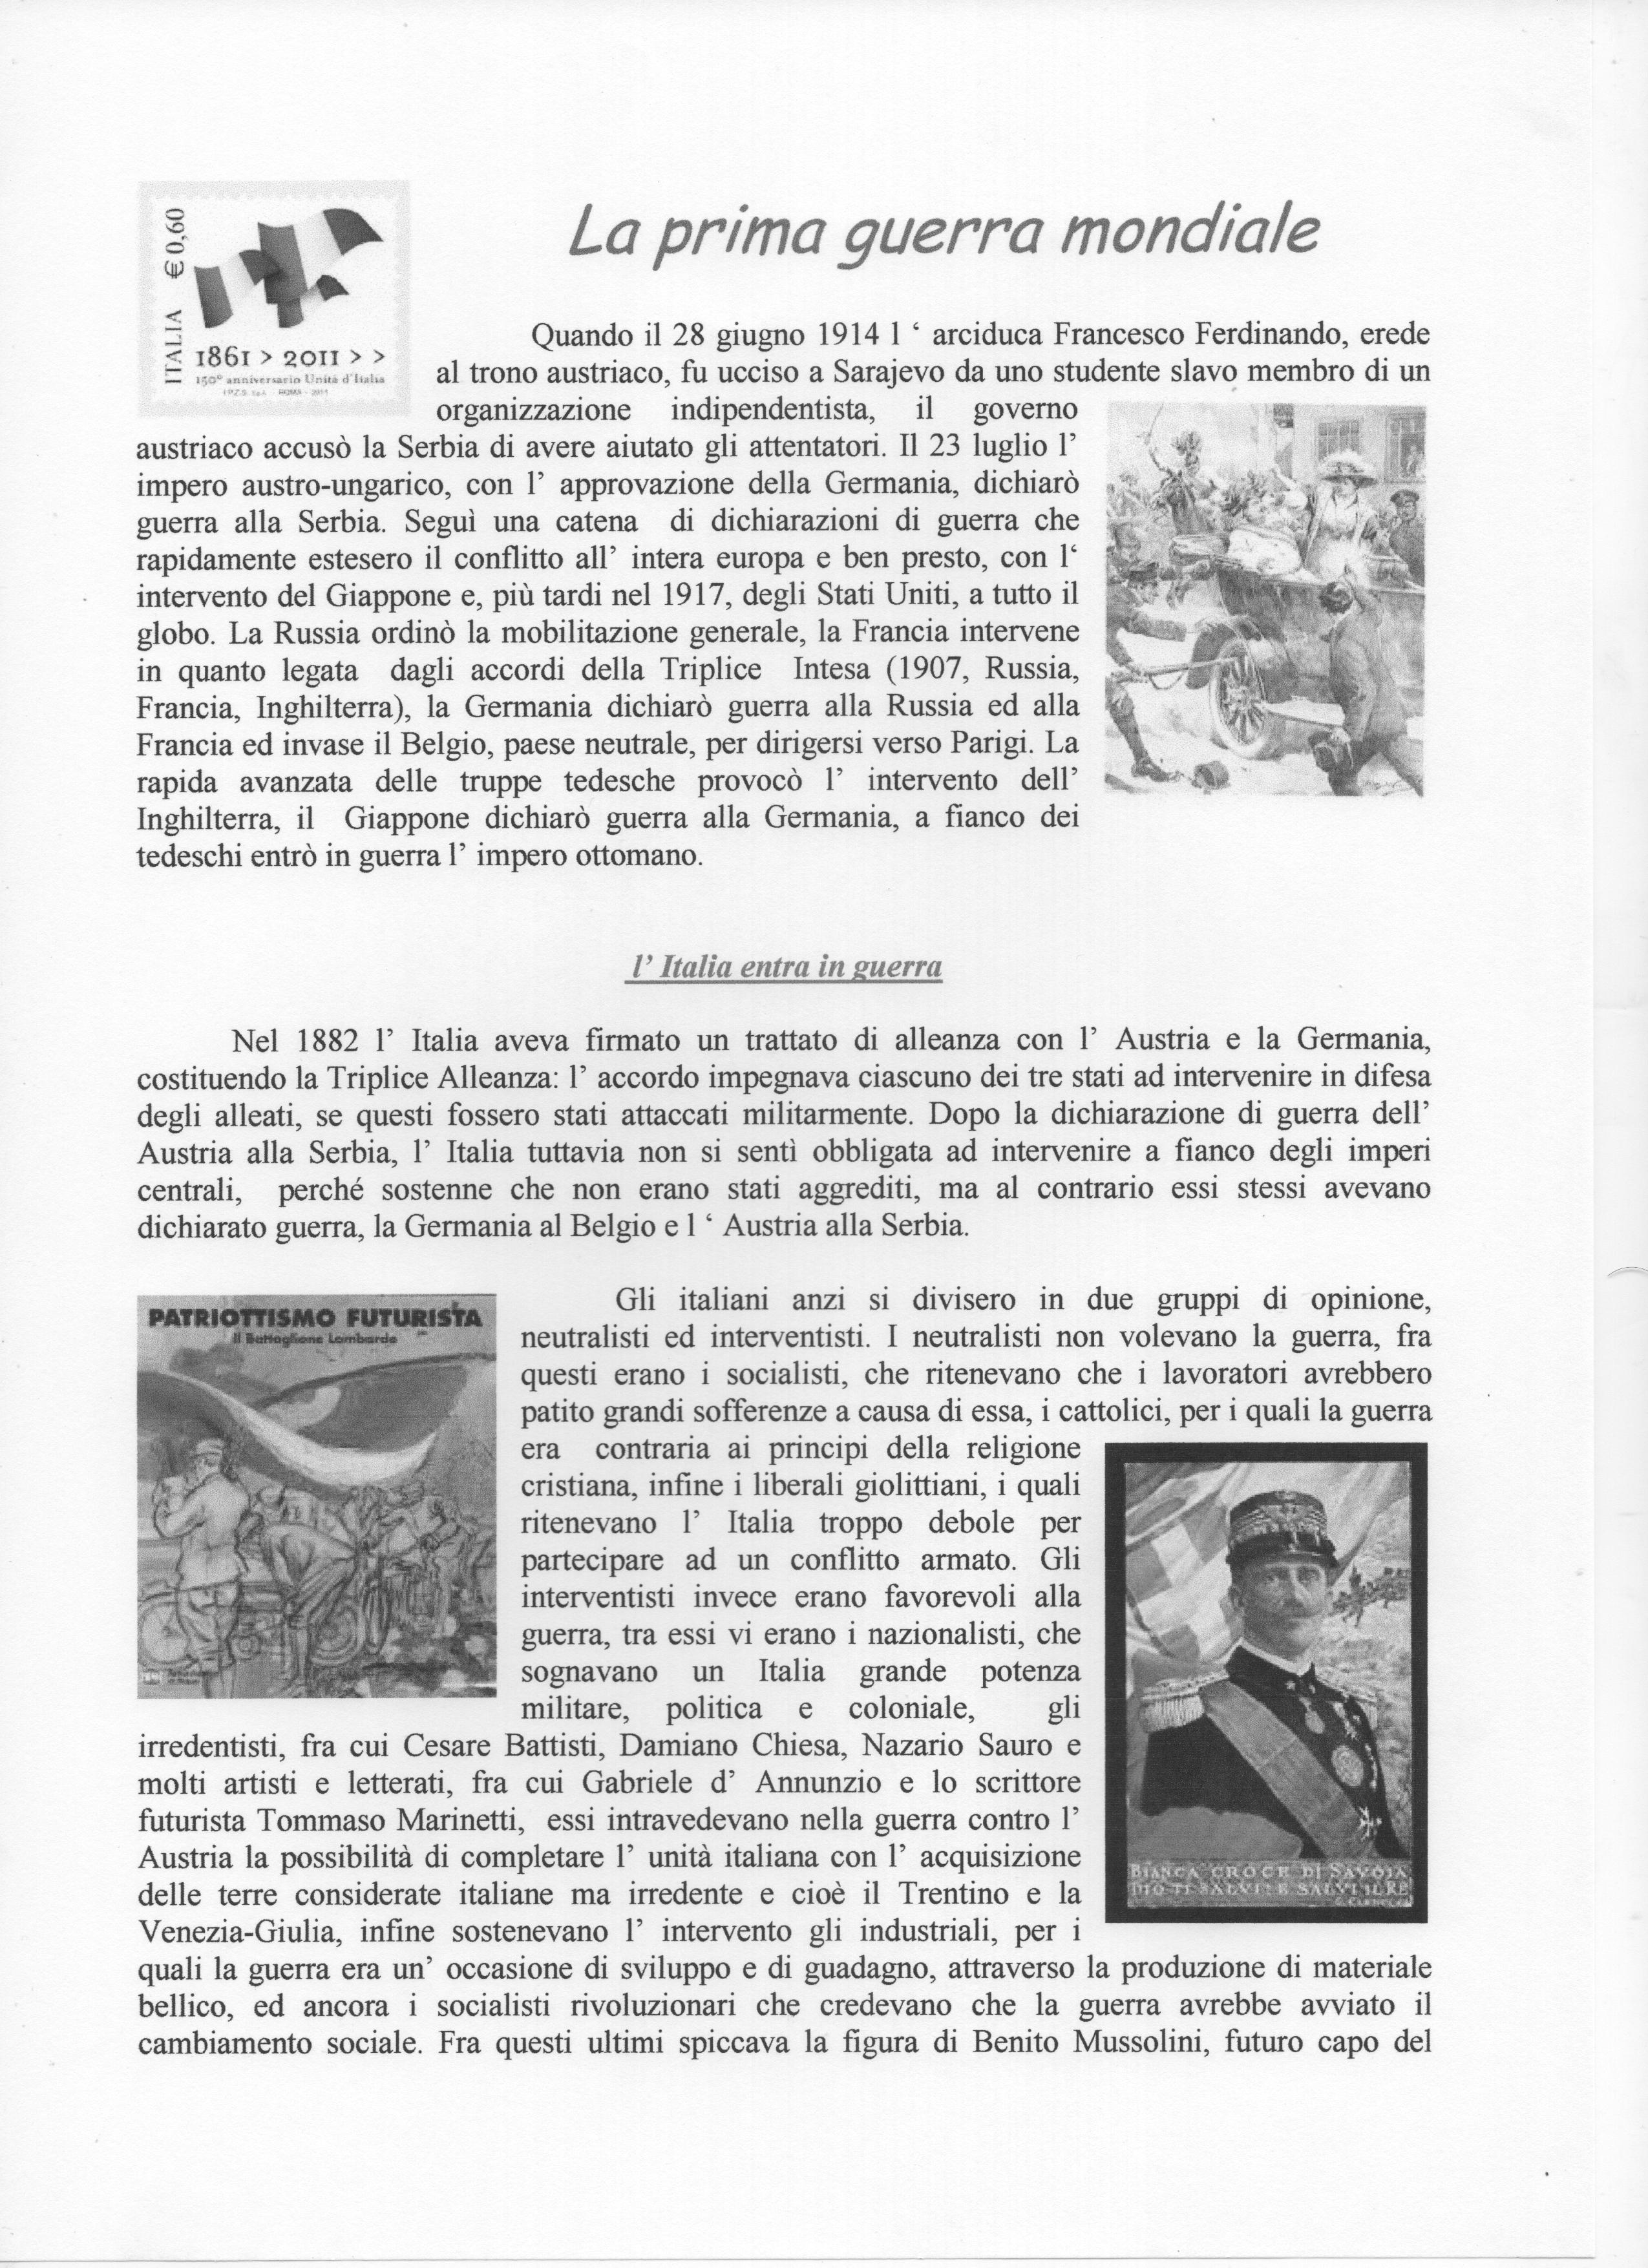 4_1_terre_irredente